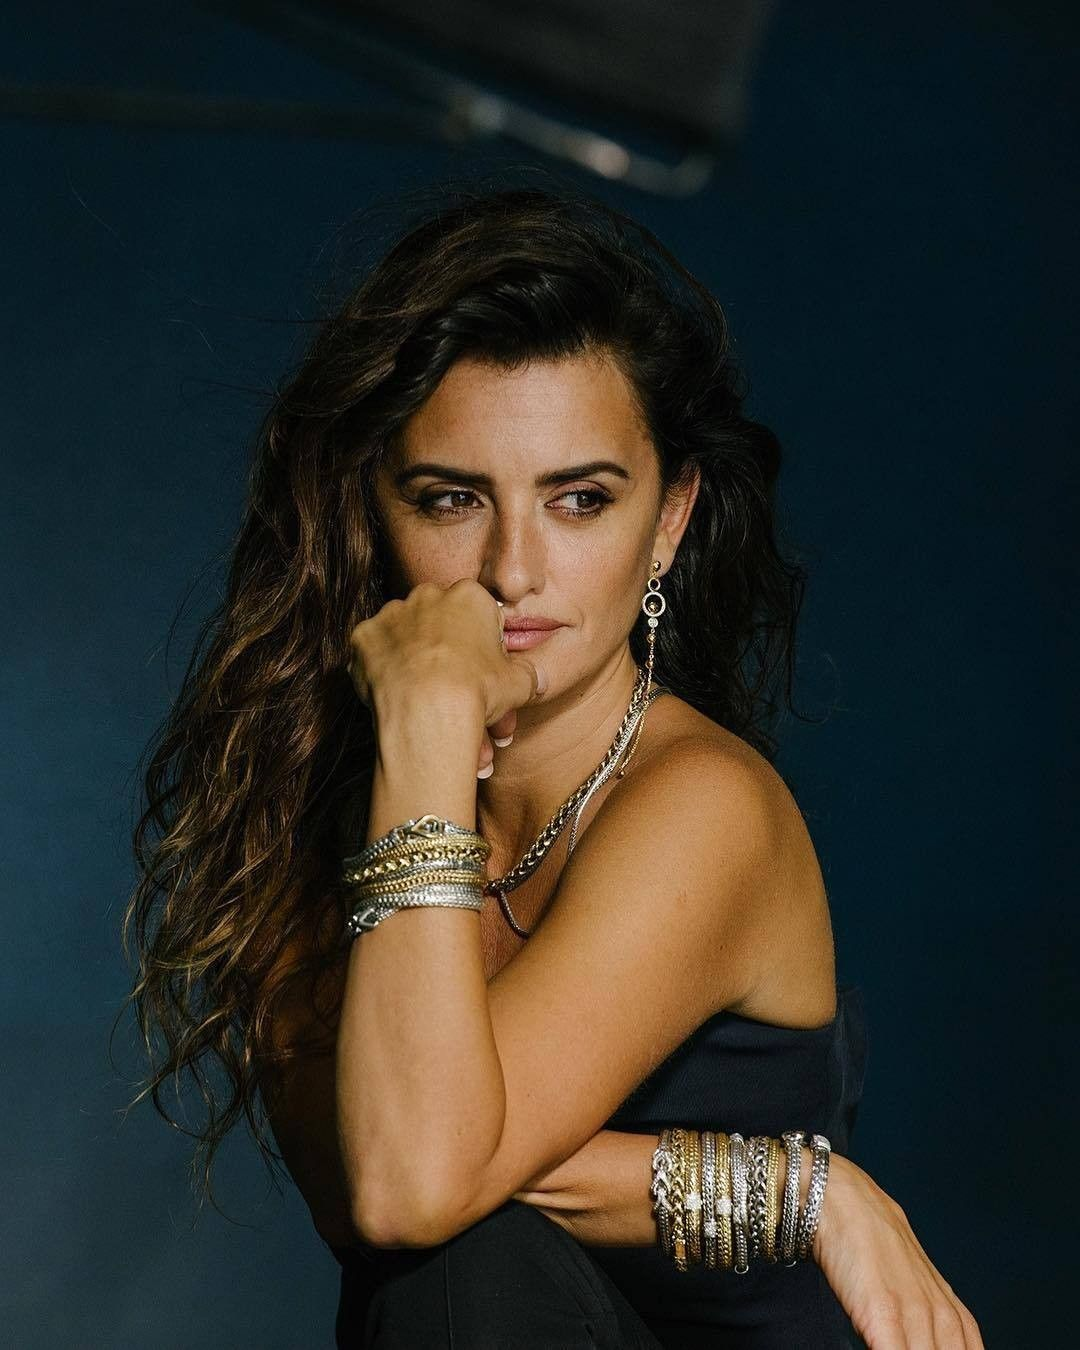 9256aaa13 Penelope Cruz on Good Jewelry, Bali, and the Importance of Treating Yourself